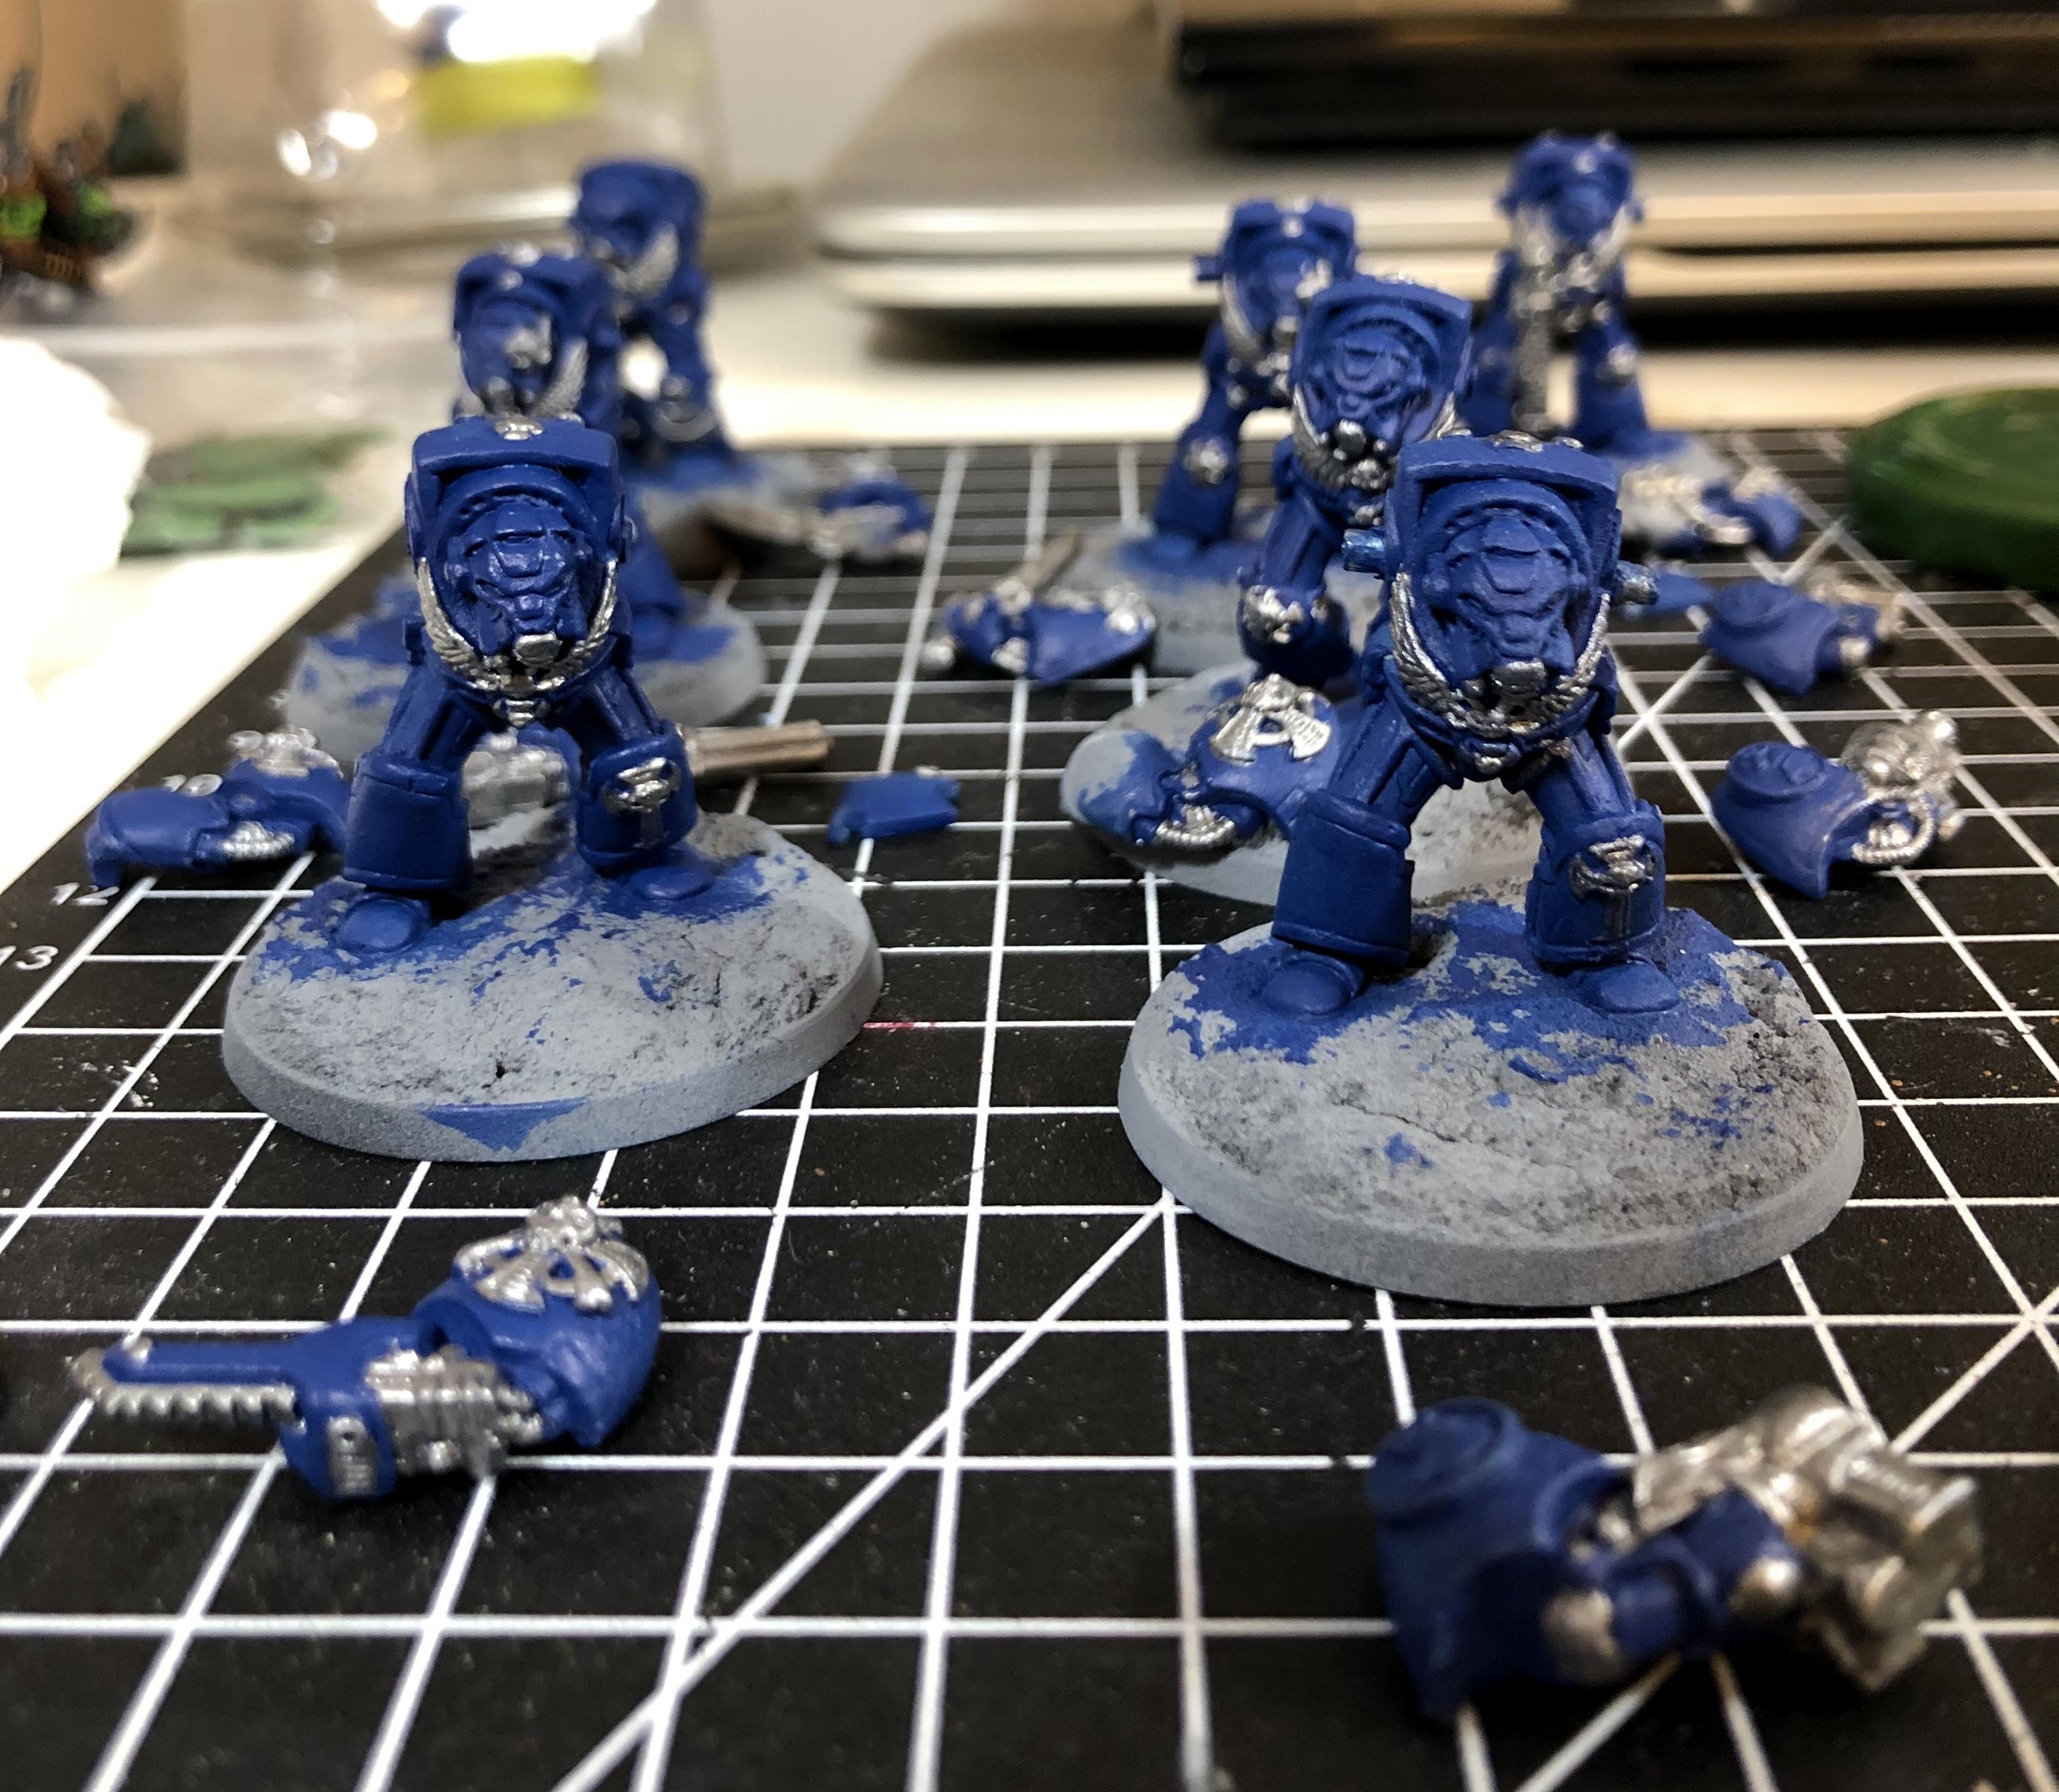 Crimson Fists, Rogue Trader, Rtb9, Space Marines, Terminator Armor, Warhammer 40,000